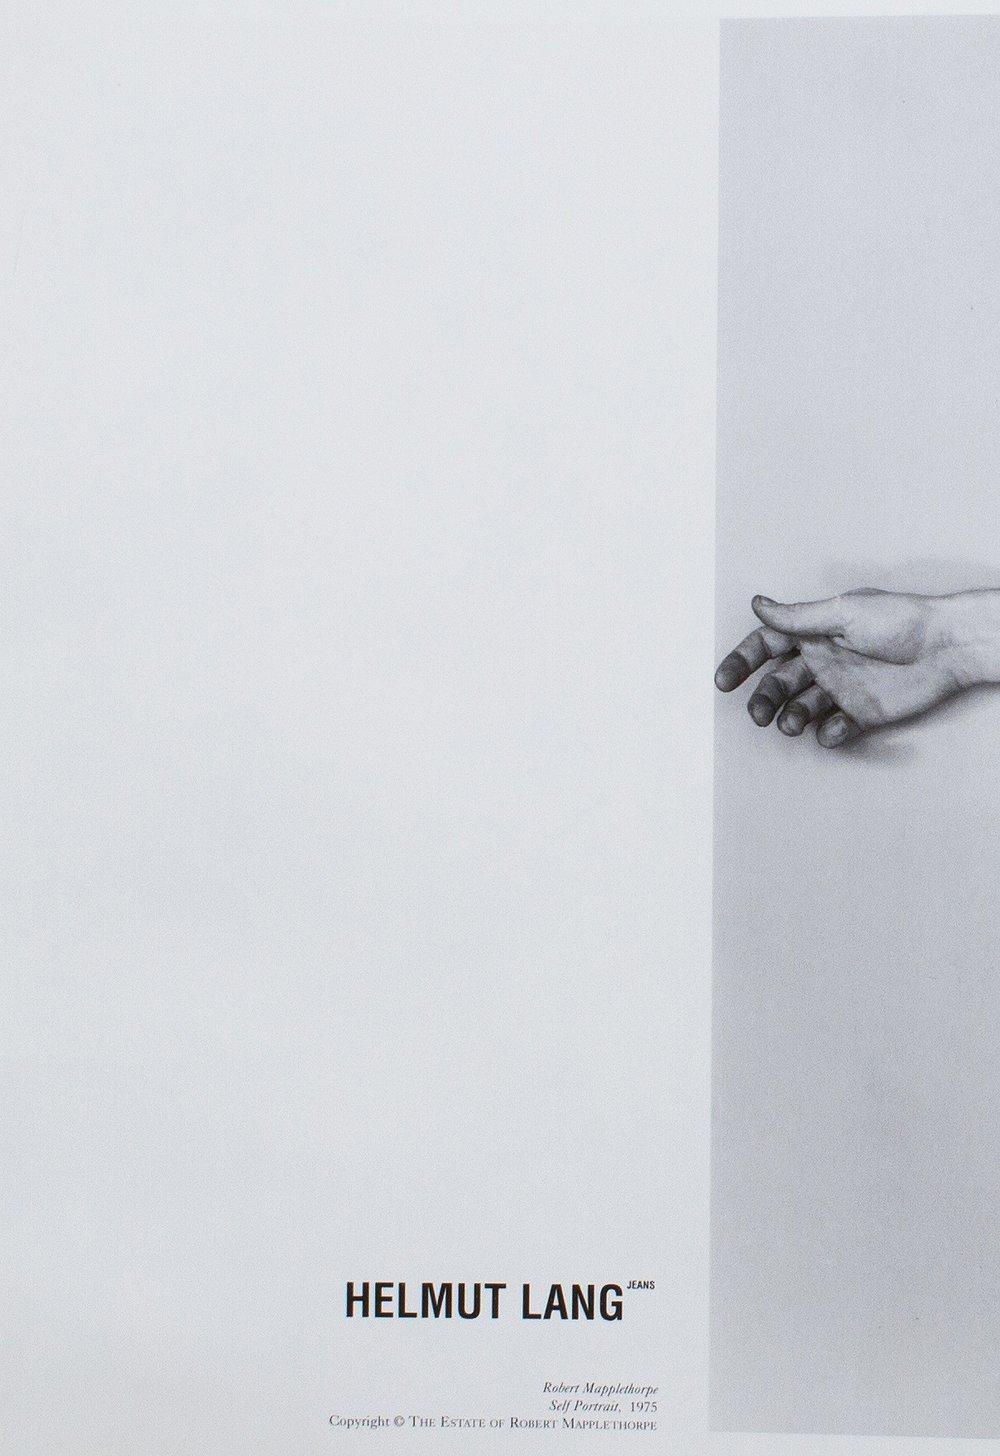 Helmut Lang ad.jpg